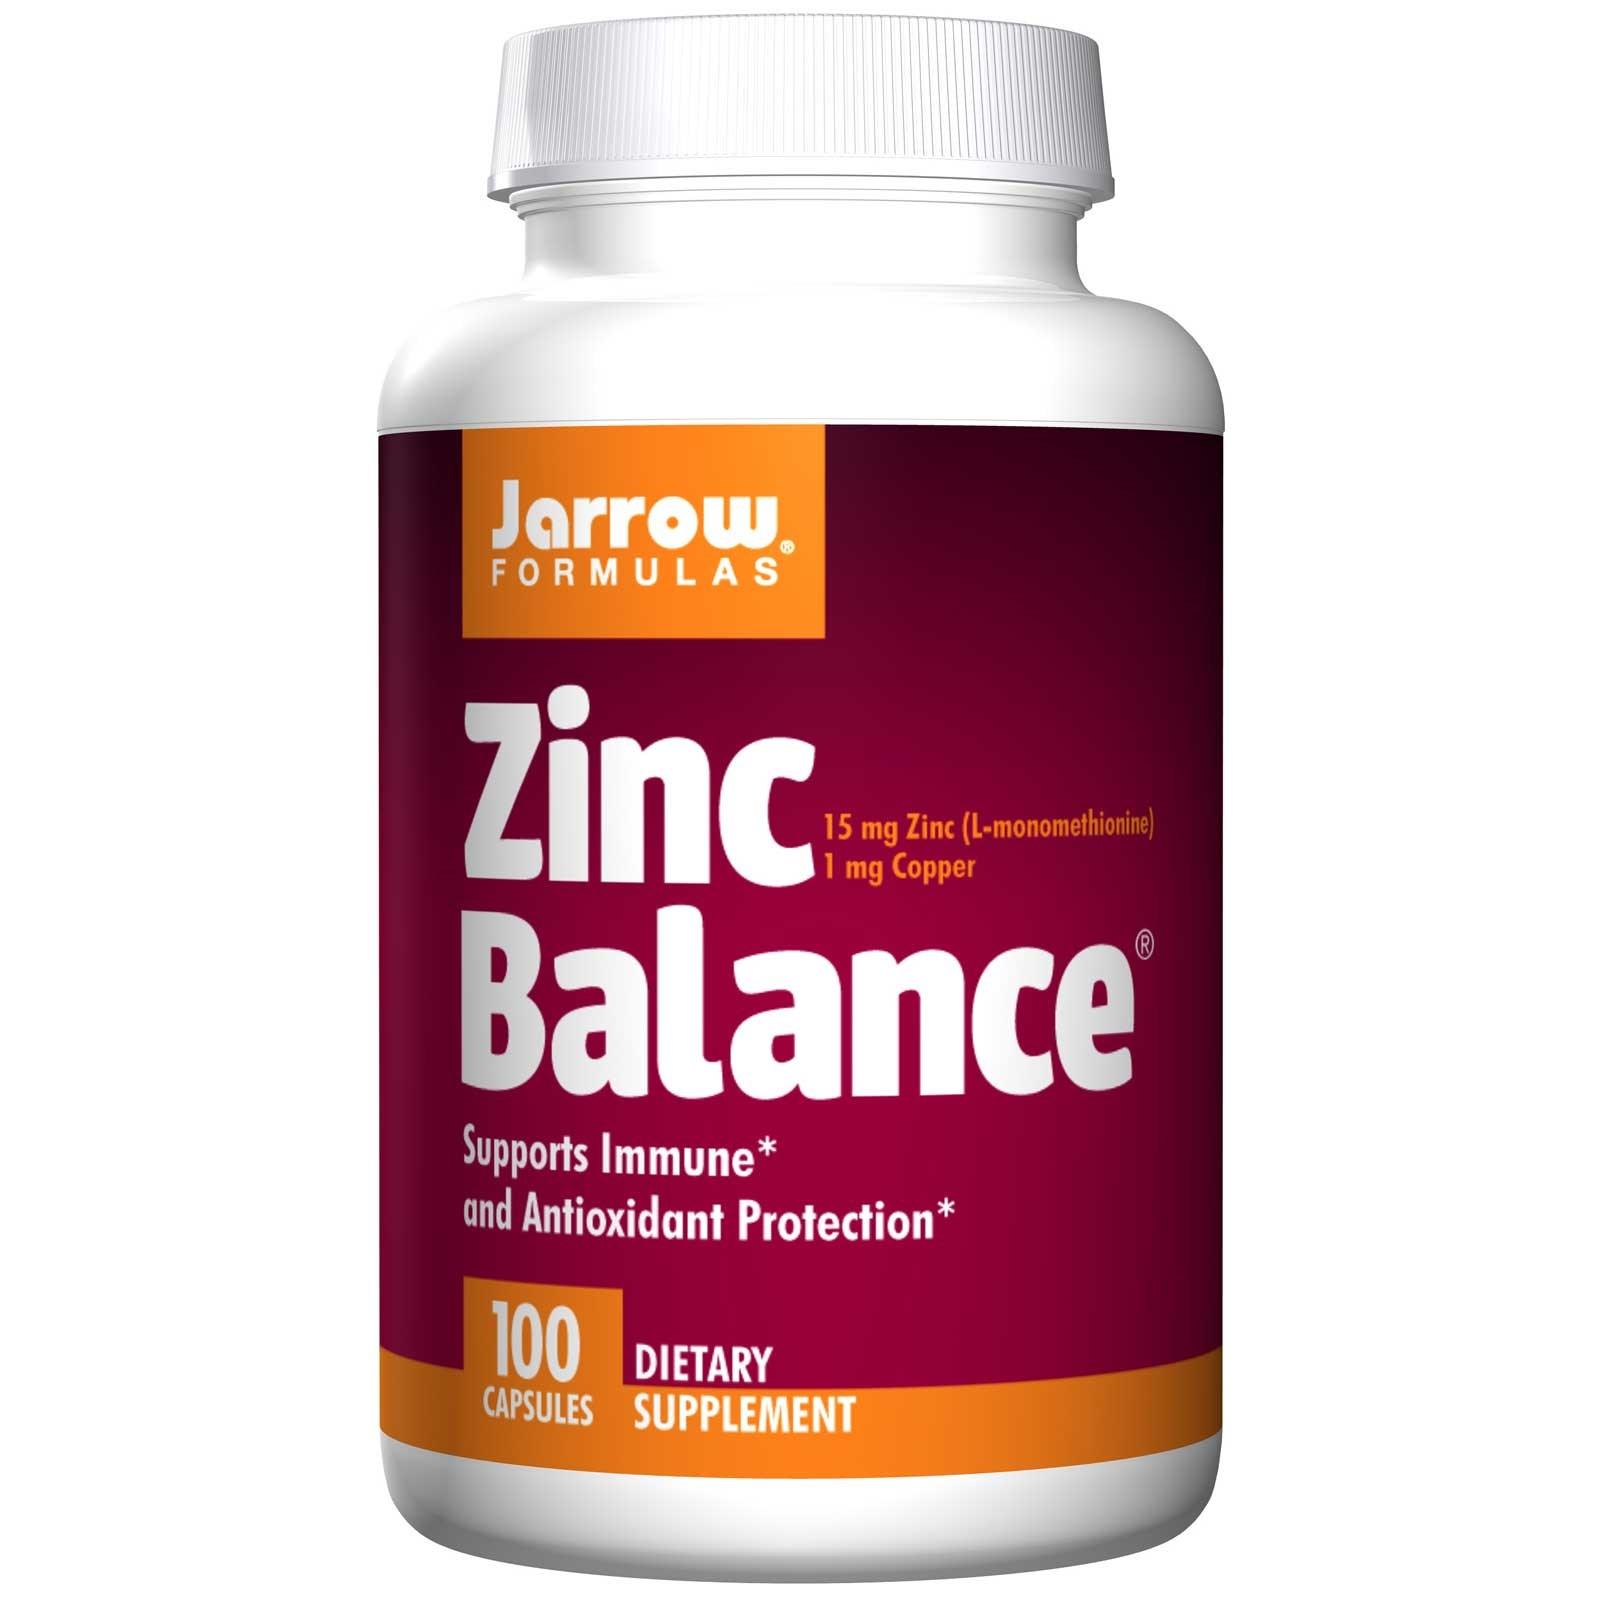 Image of Zinc Balance (100 Capsules) - Jarrow Formulas 0790011130086